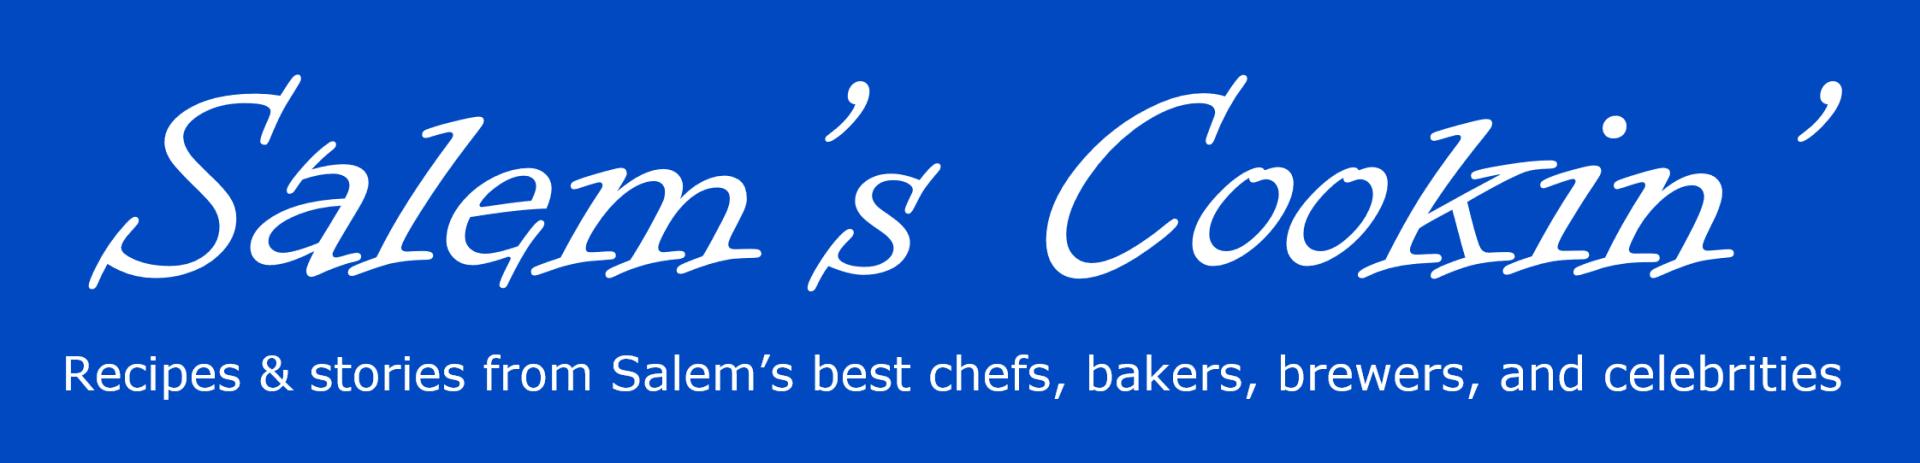 Cookbook-Title.PNG-w1920.jpg